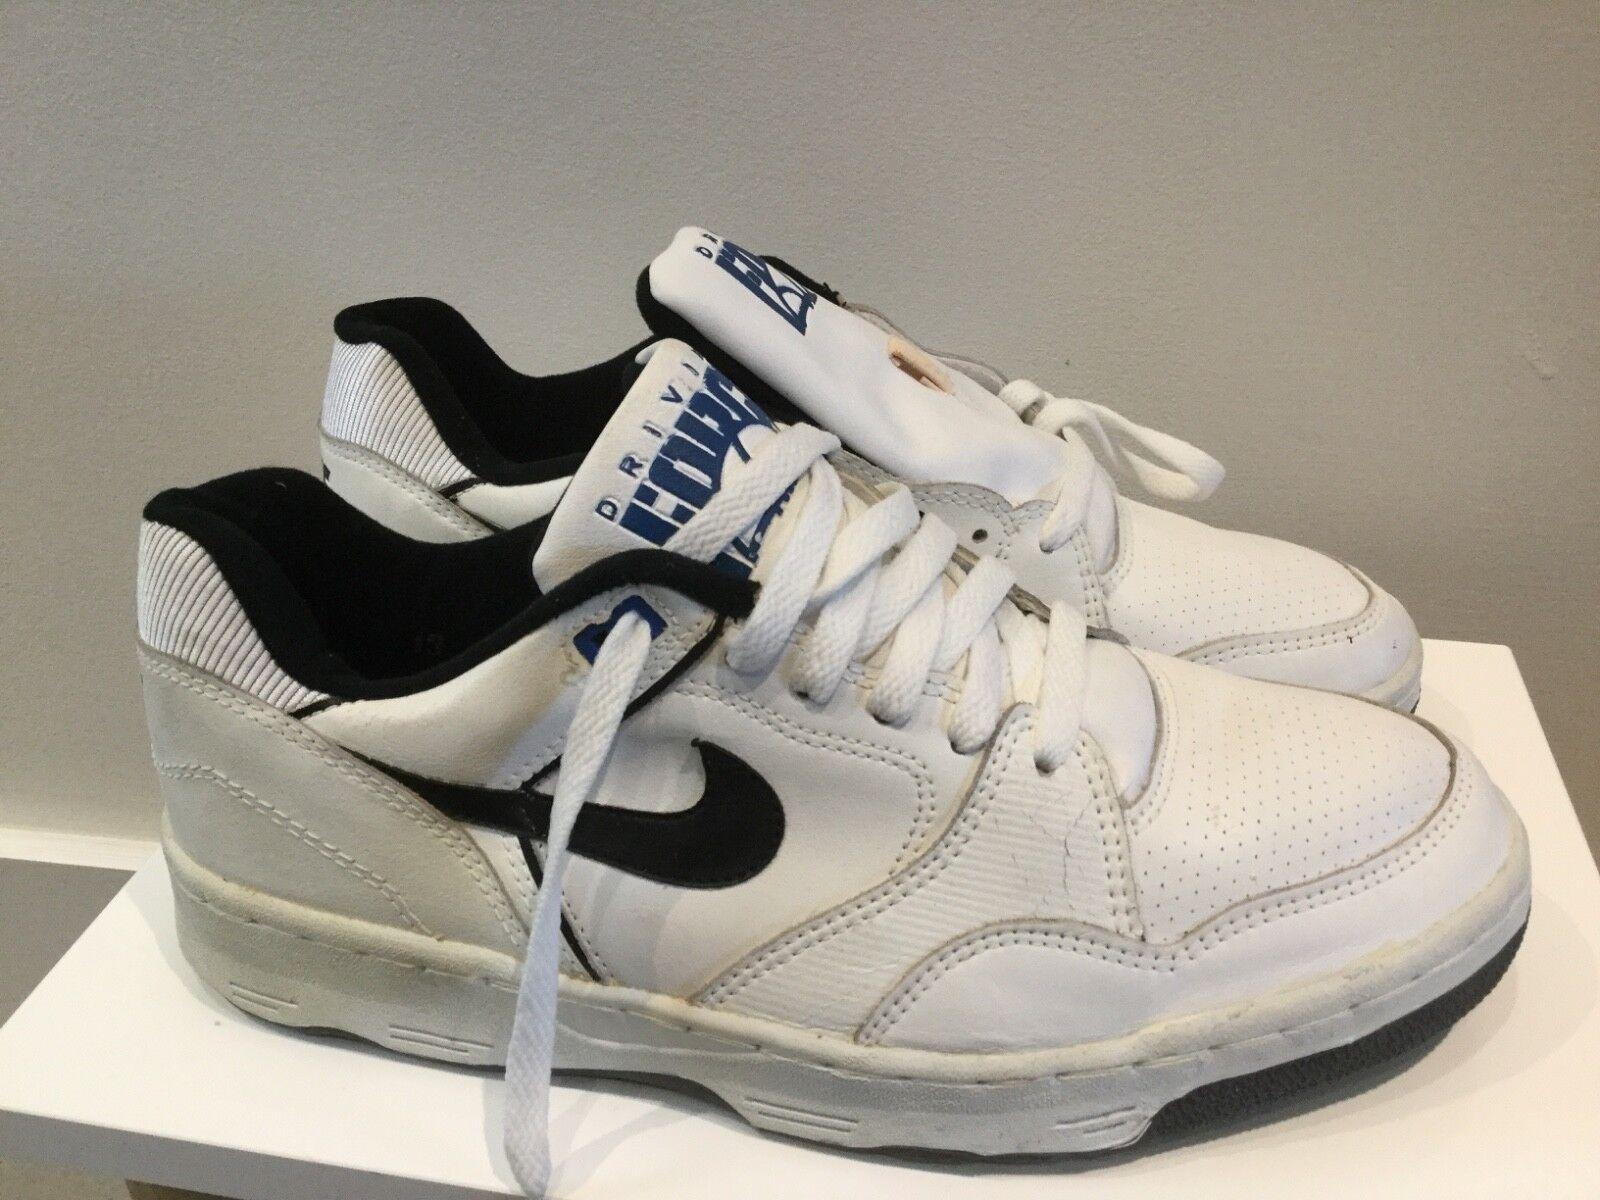 Vintage nn. nike motore mai messo le scarpe da ginnastica scarpe 13 raro 1989